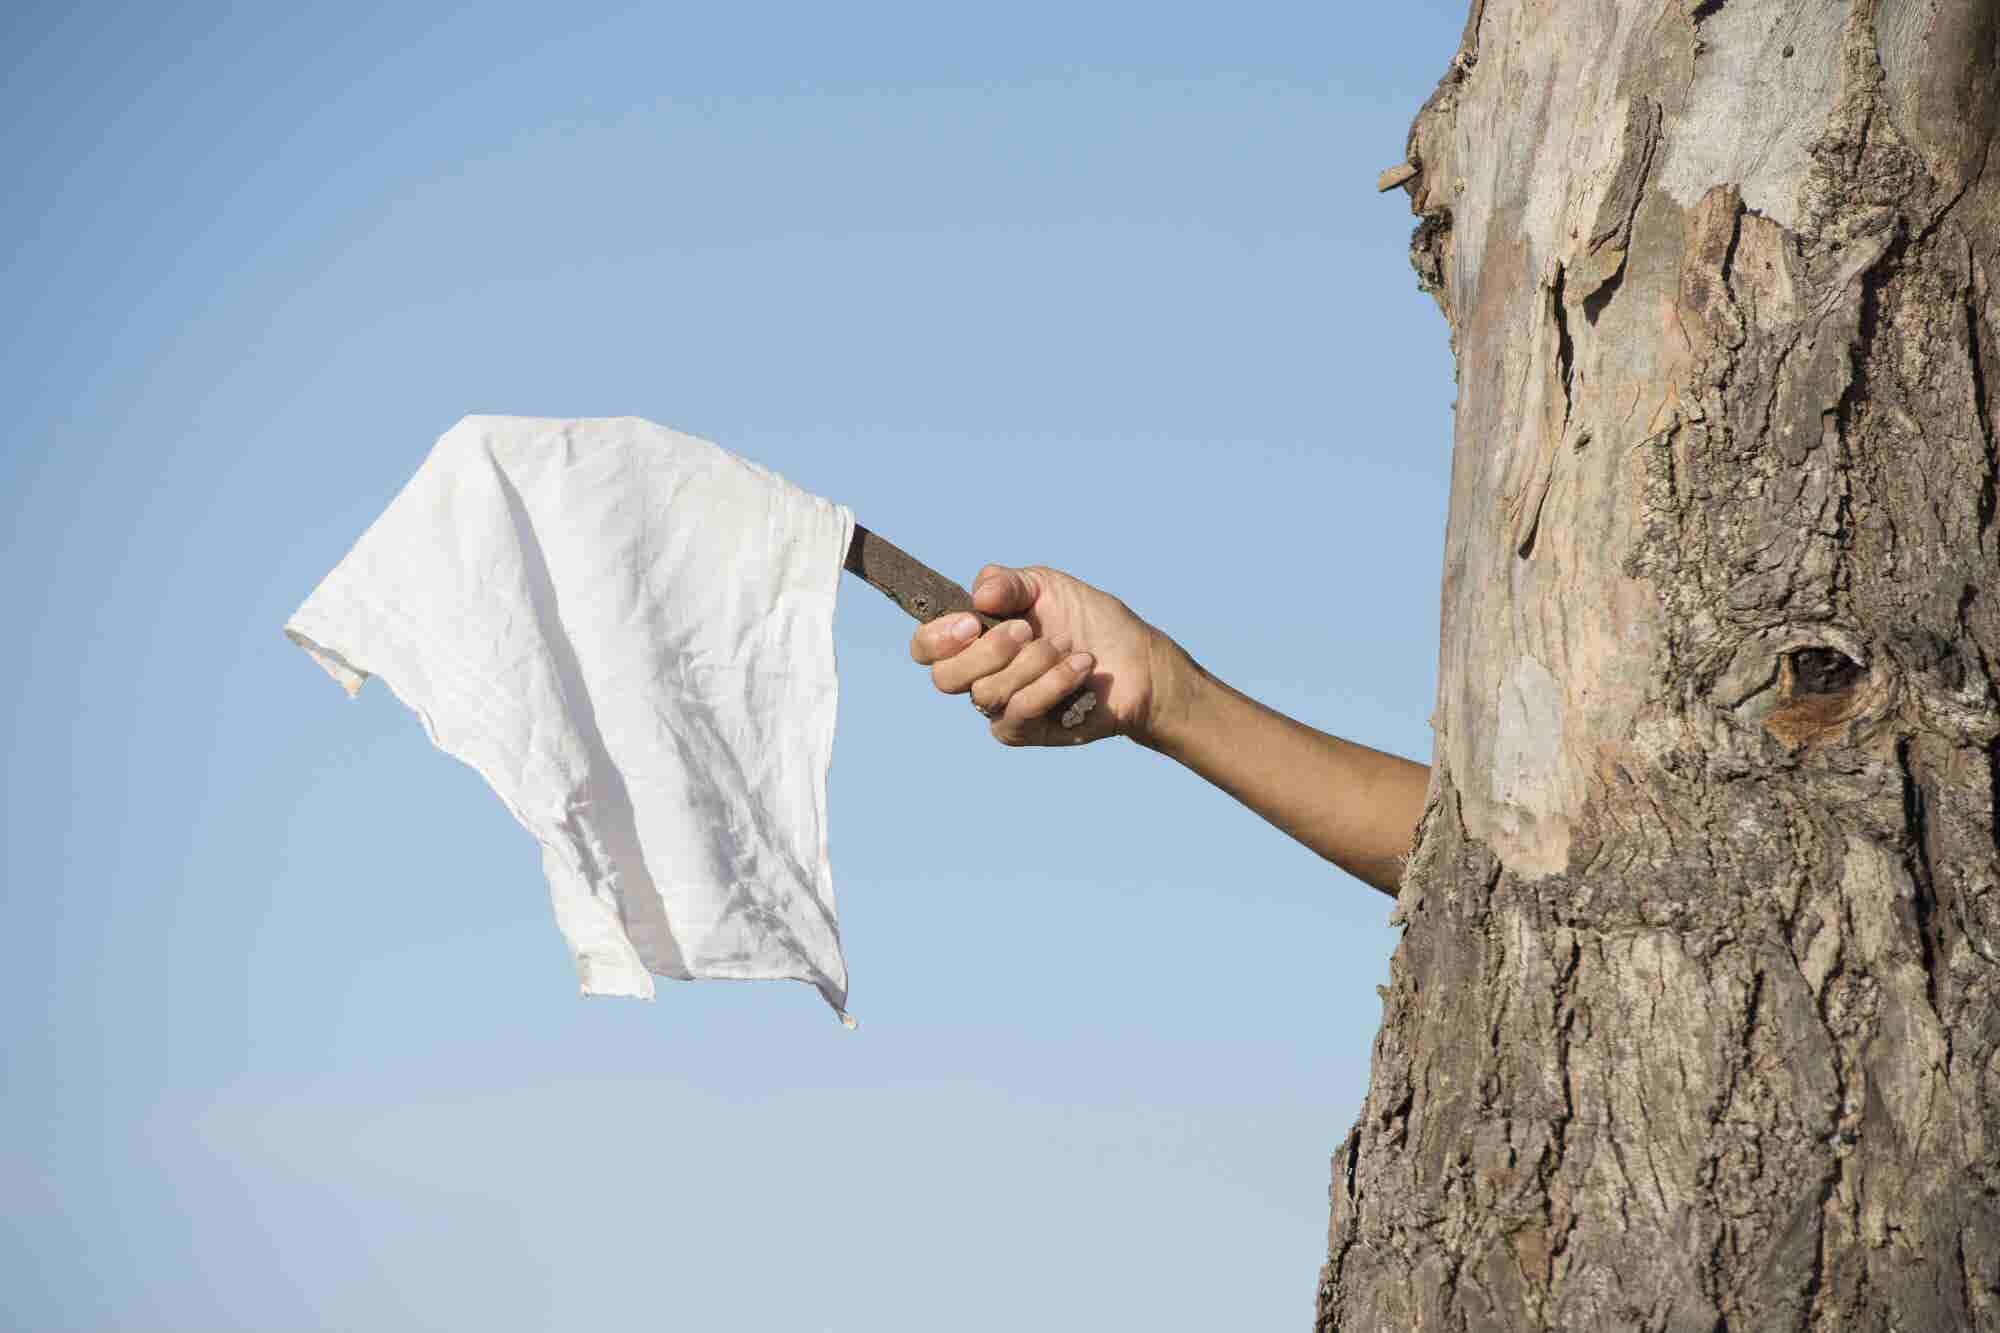 ¿Debes abandonar tu idea de negocio? Checa estos tips antes de 'tirar la toalla'